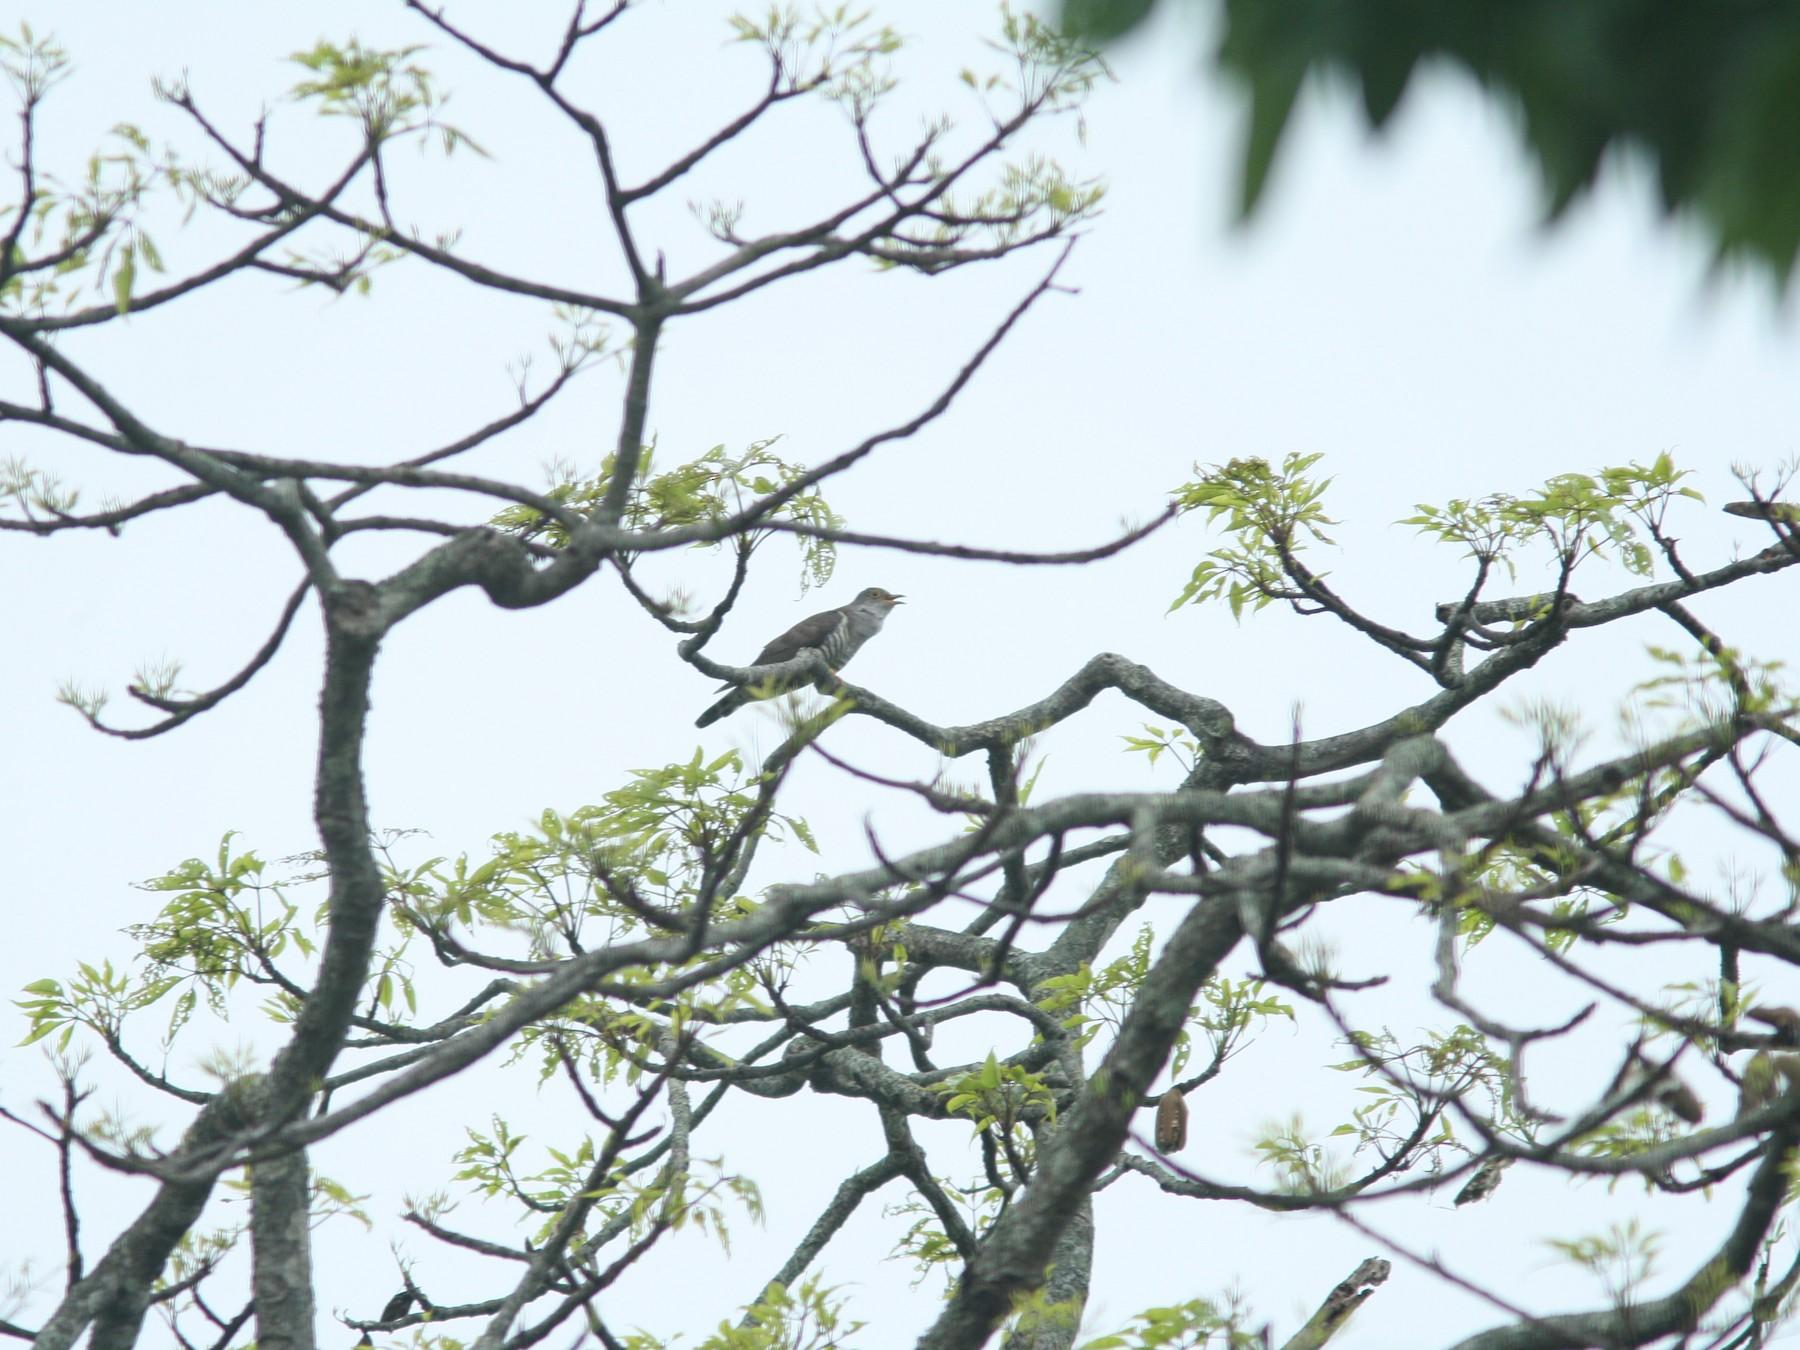 Indian Cuckoo - PANKAJ GUPTA